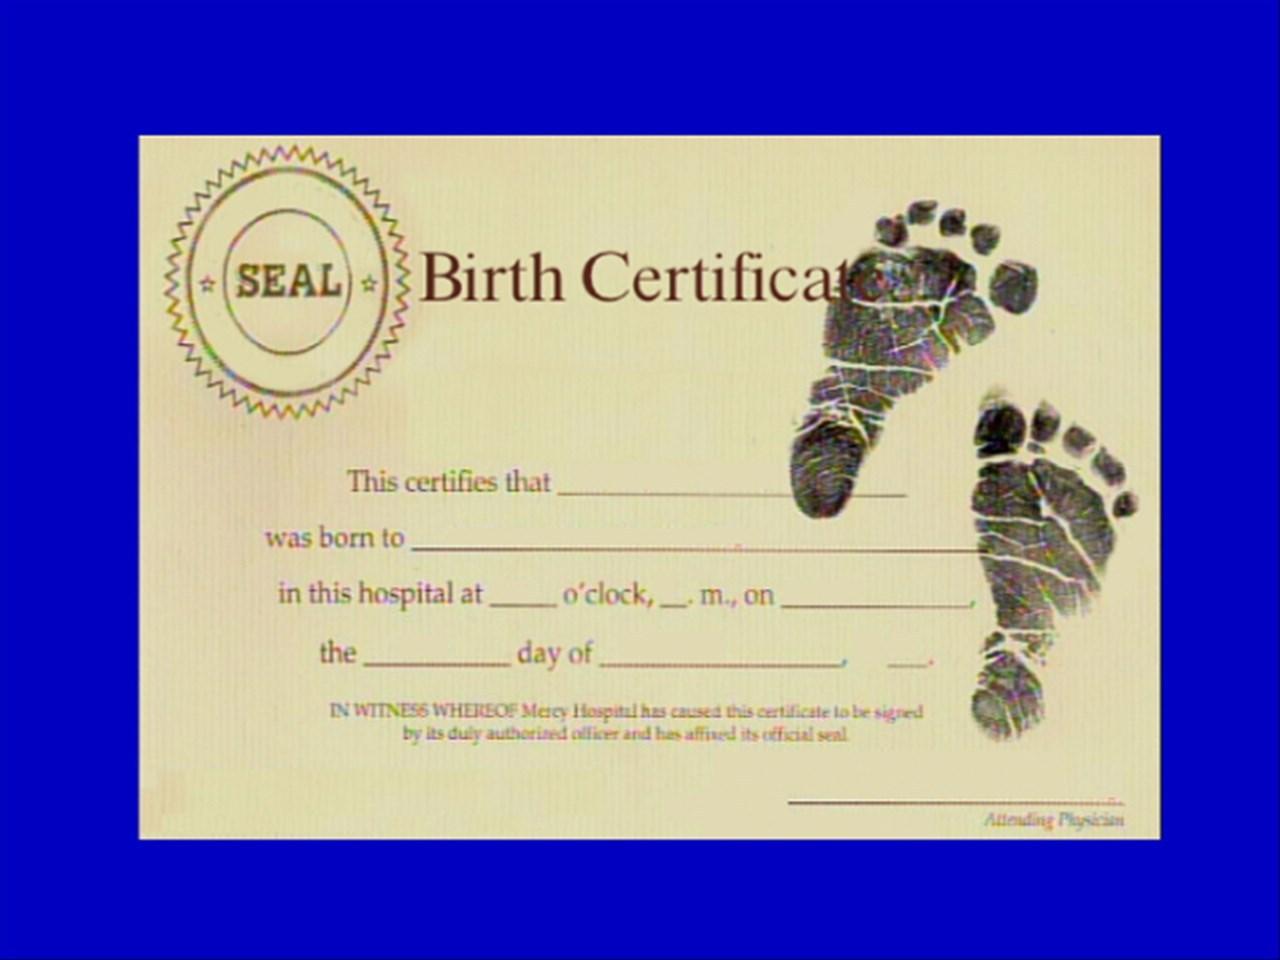 Mosijub Birth Certificate Options 3038102 2018